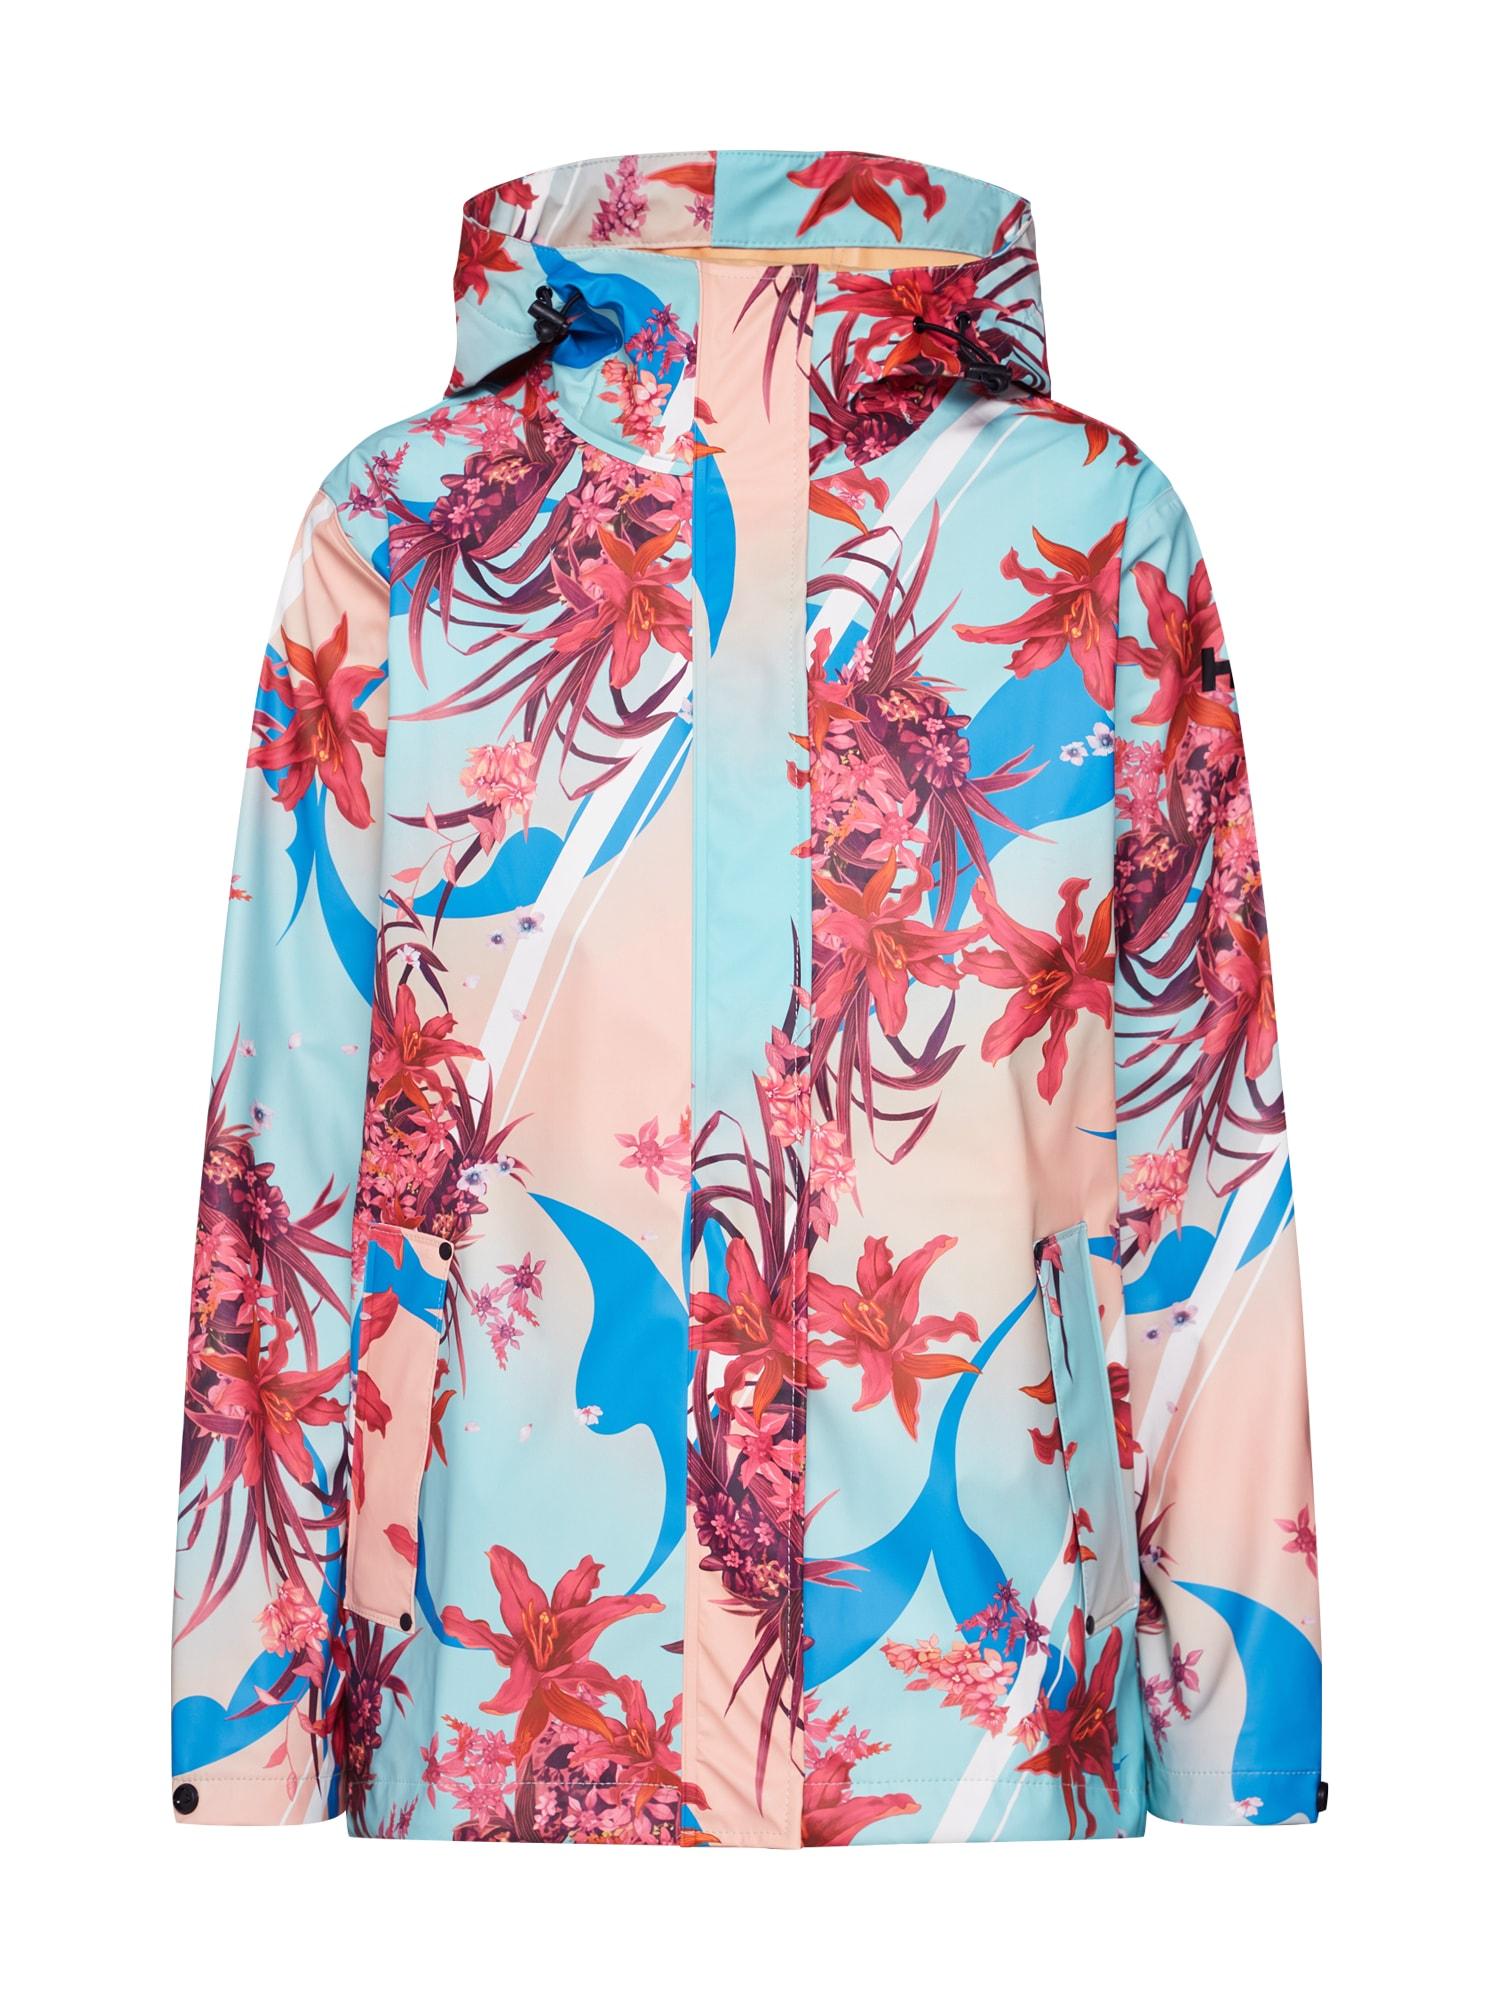 Přechodná bunda W MOSS modrá mix barev pink HELLY HANSEN